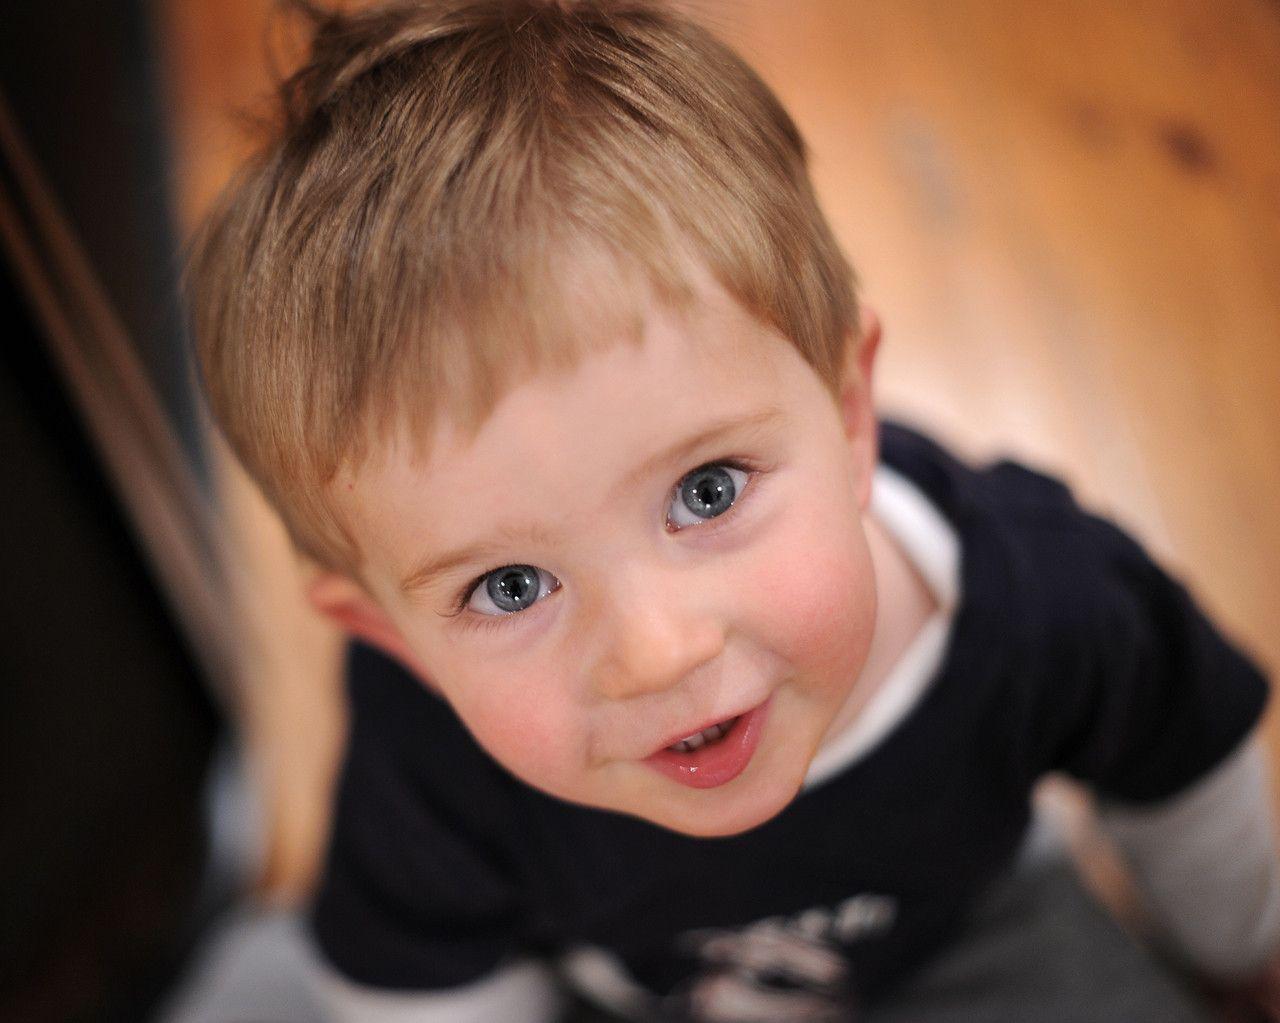 Cute Little Babies Hq 2 Wallpapers: Little Boy Wallpapers